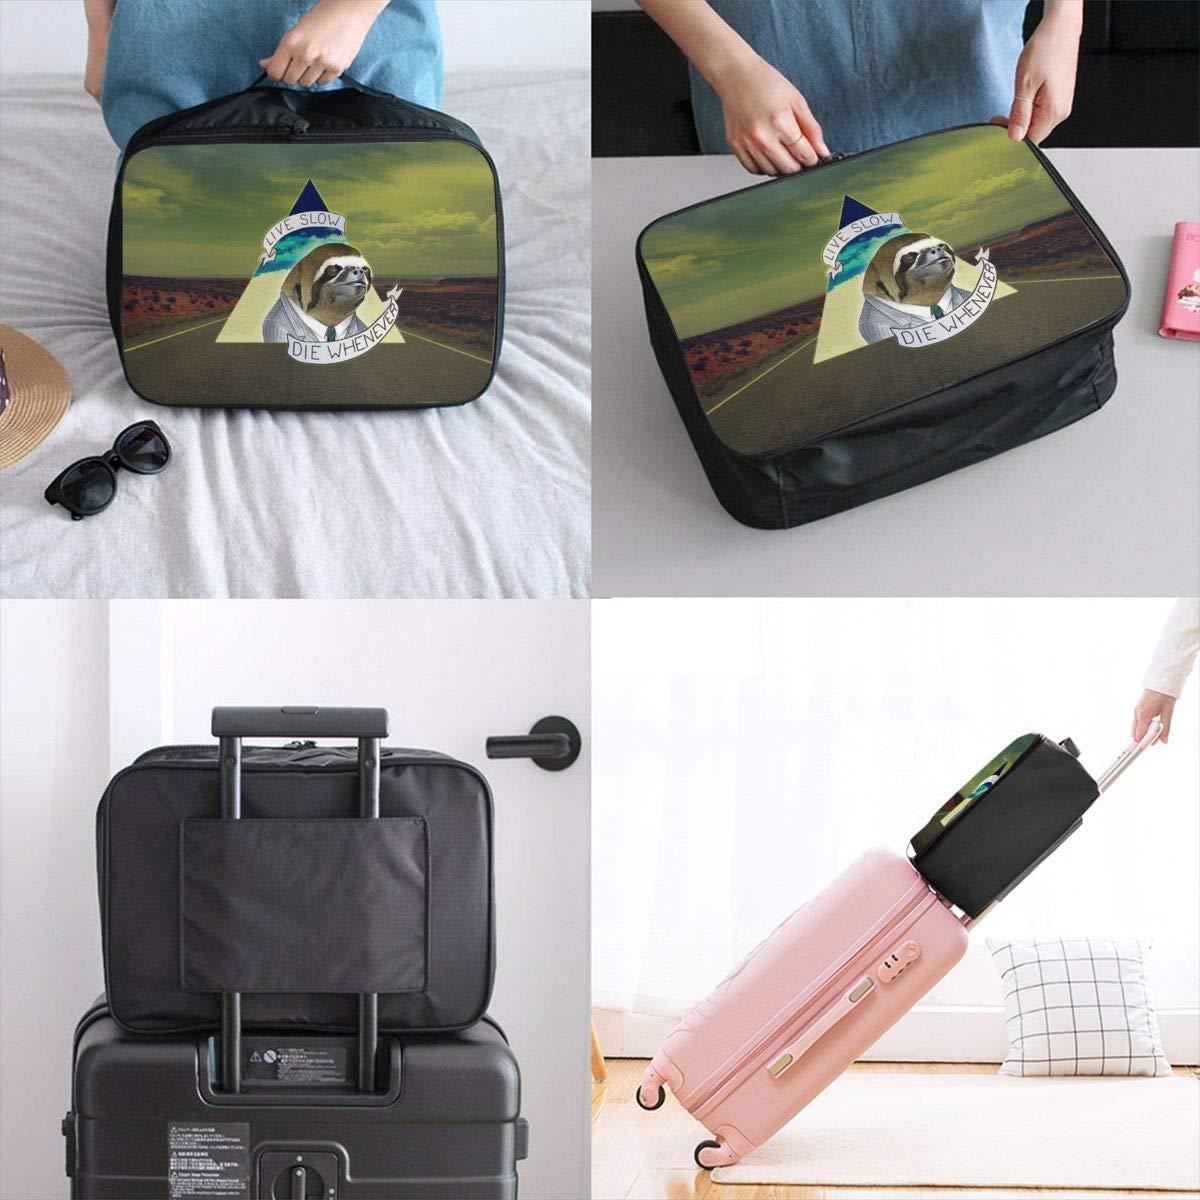 Live Slow Travel Luggage Storage Bag Duffel Bag Handle Makeup Bag Fashion Lightweight Large Capacity Portable Luggage Bag